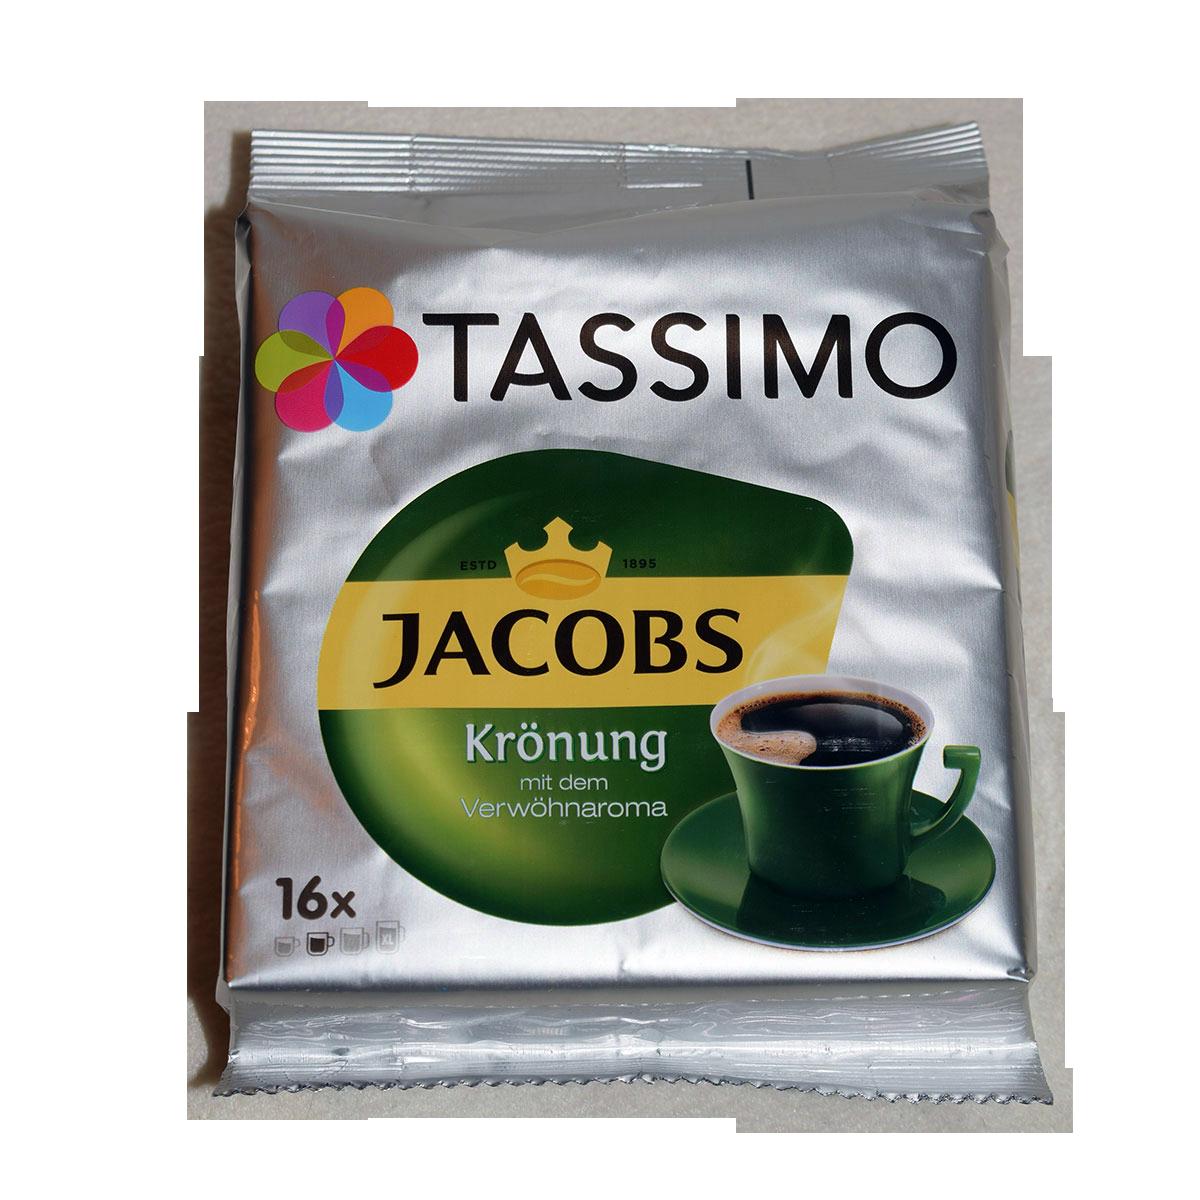 Jacobs-Tassimo-Cappuccino-260g